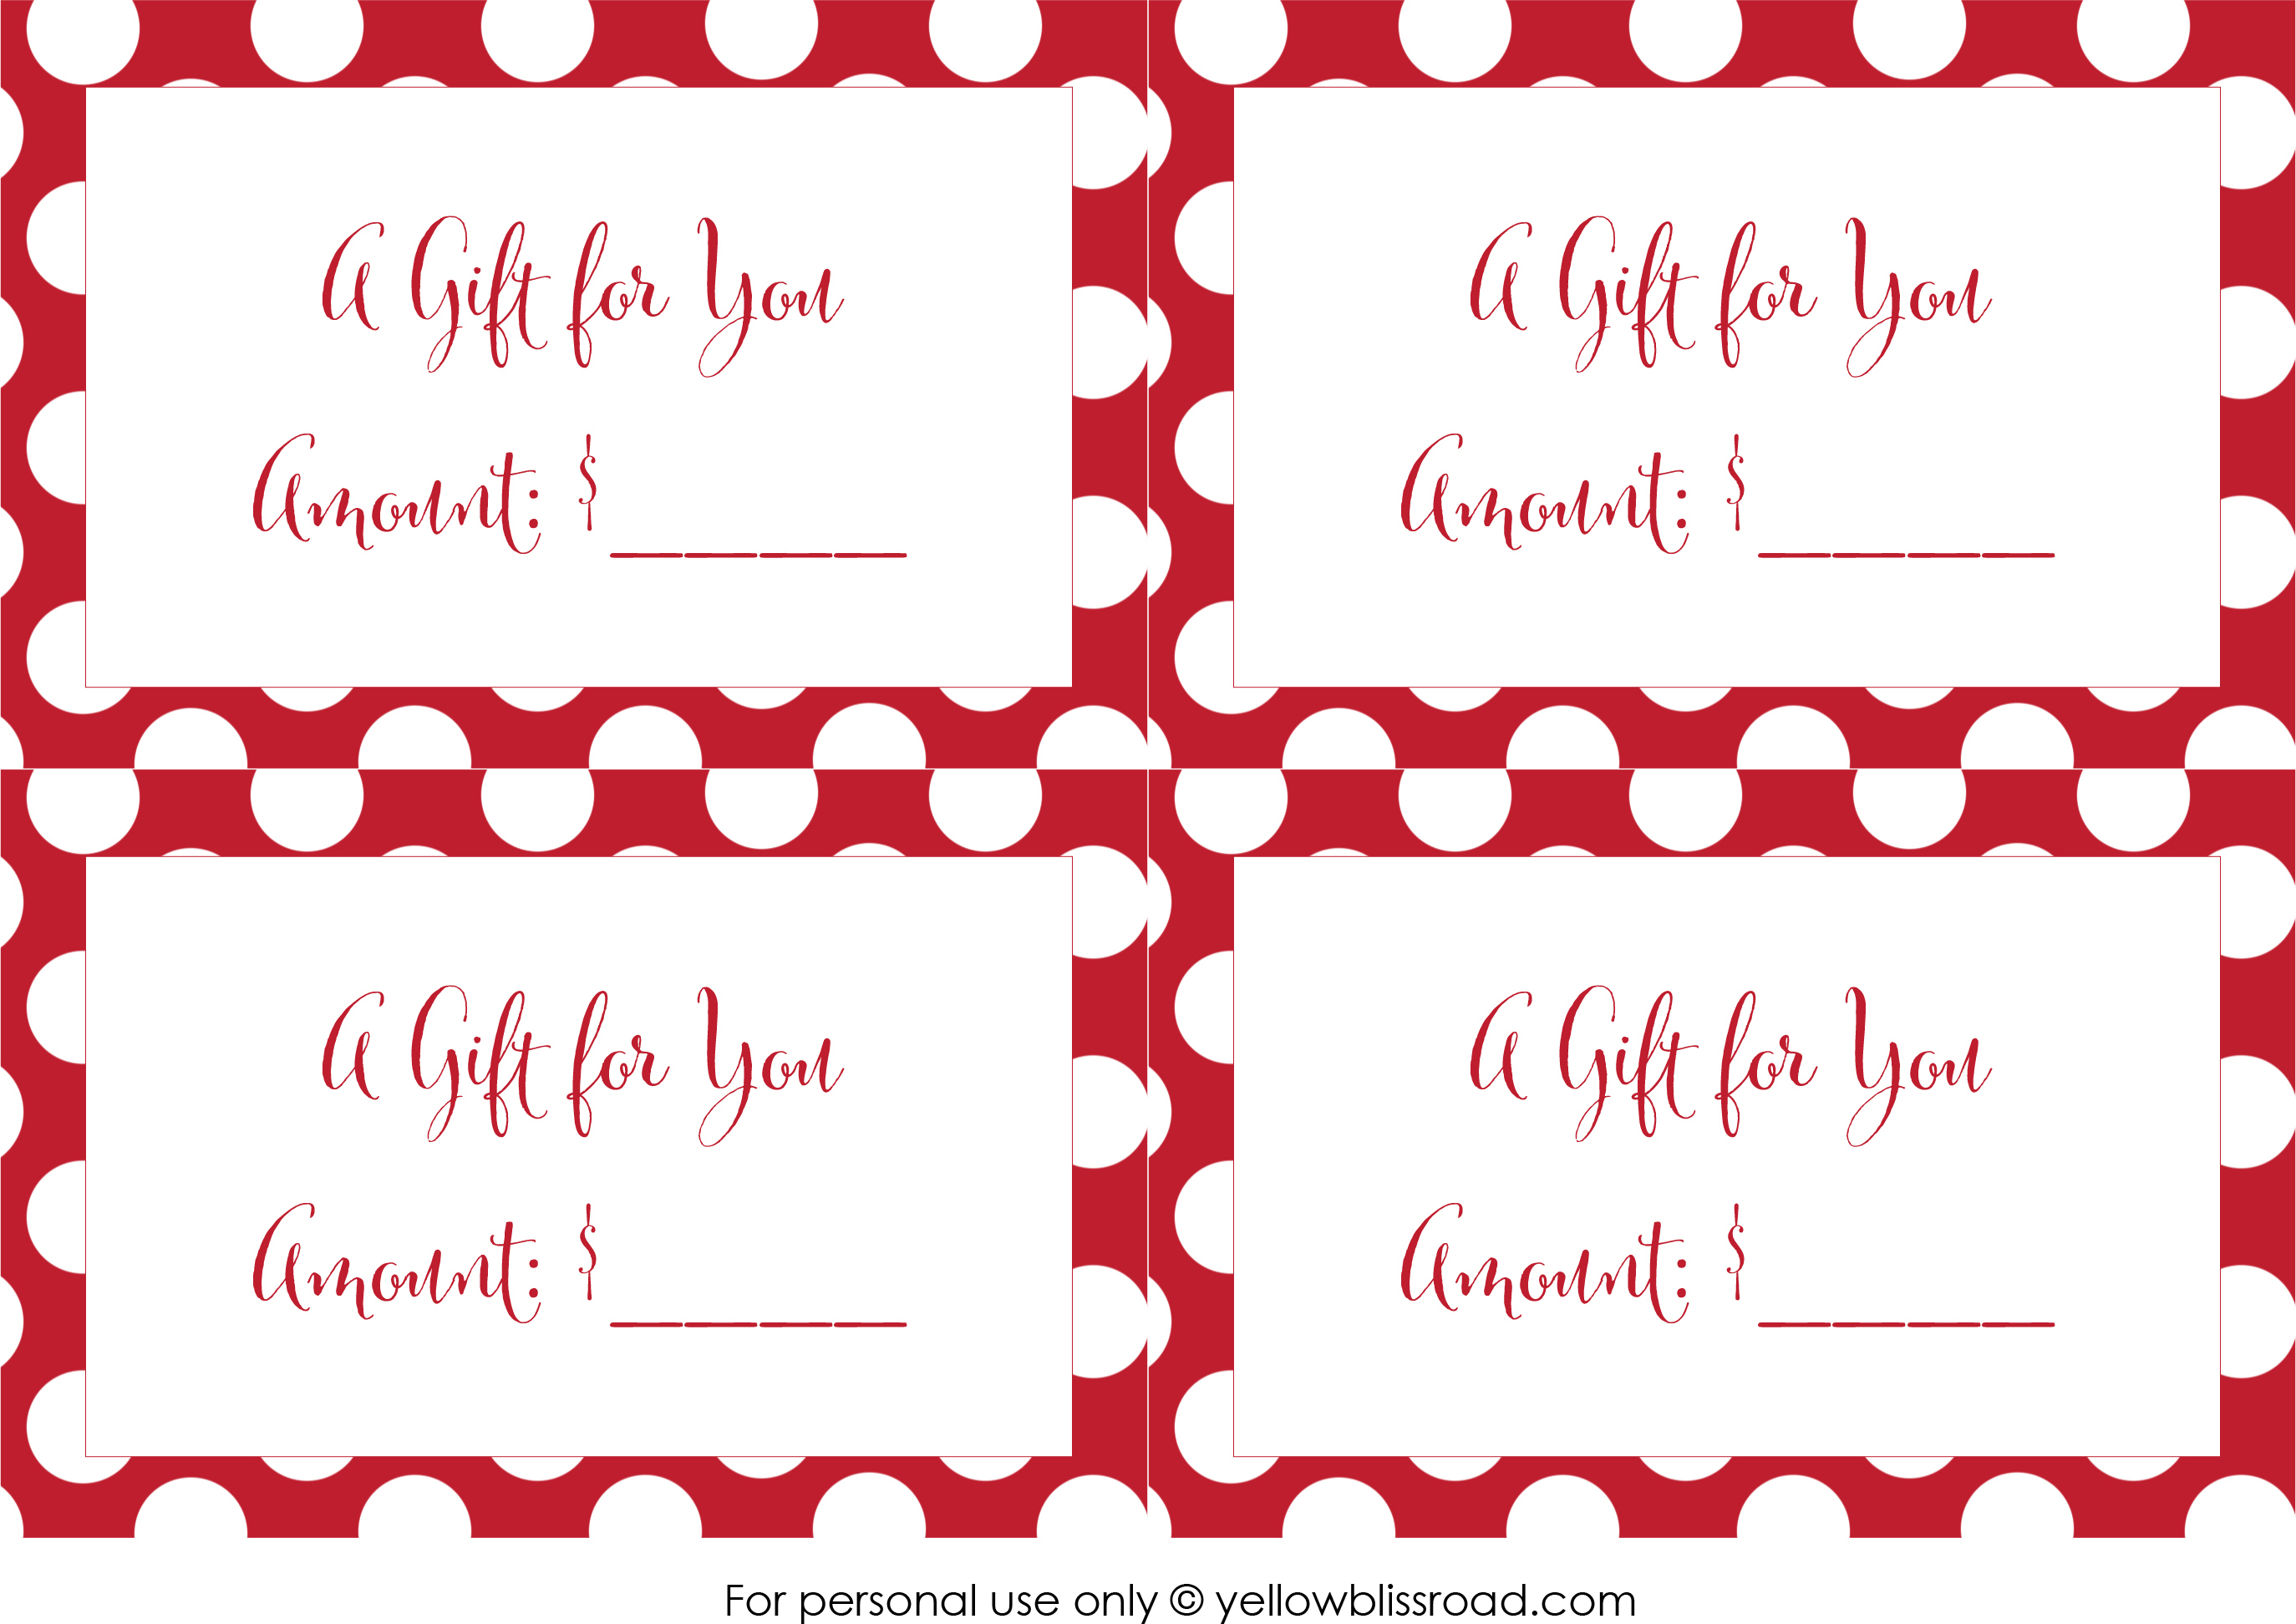 Printable Christmas Gift Certificates Image Collections - Free - Free Printable Christmas Gift Voucher Templates